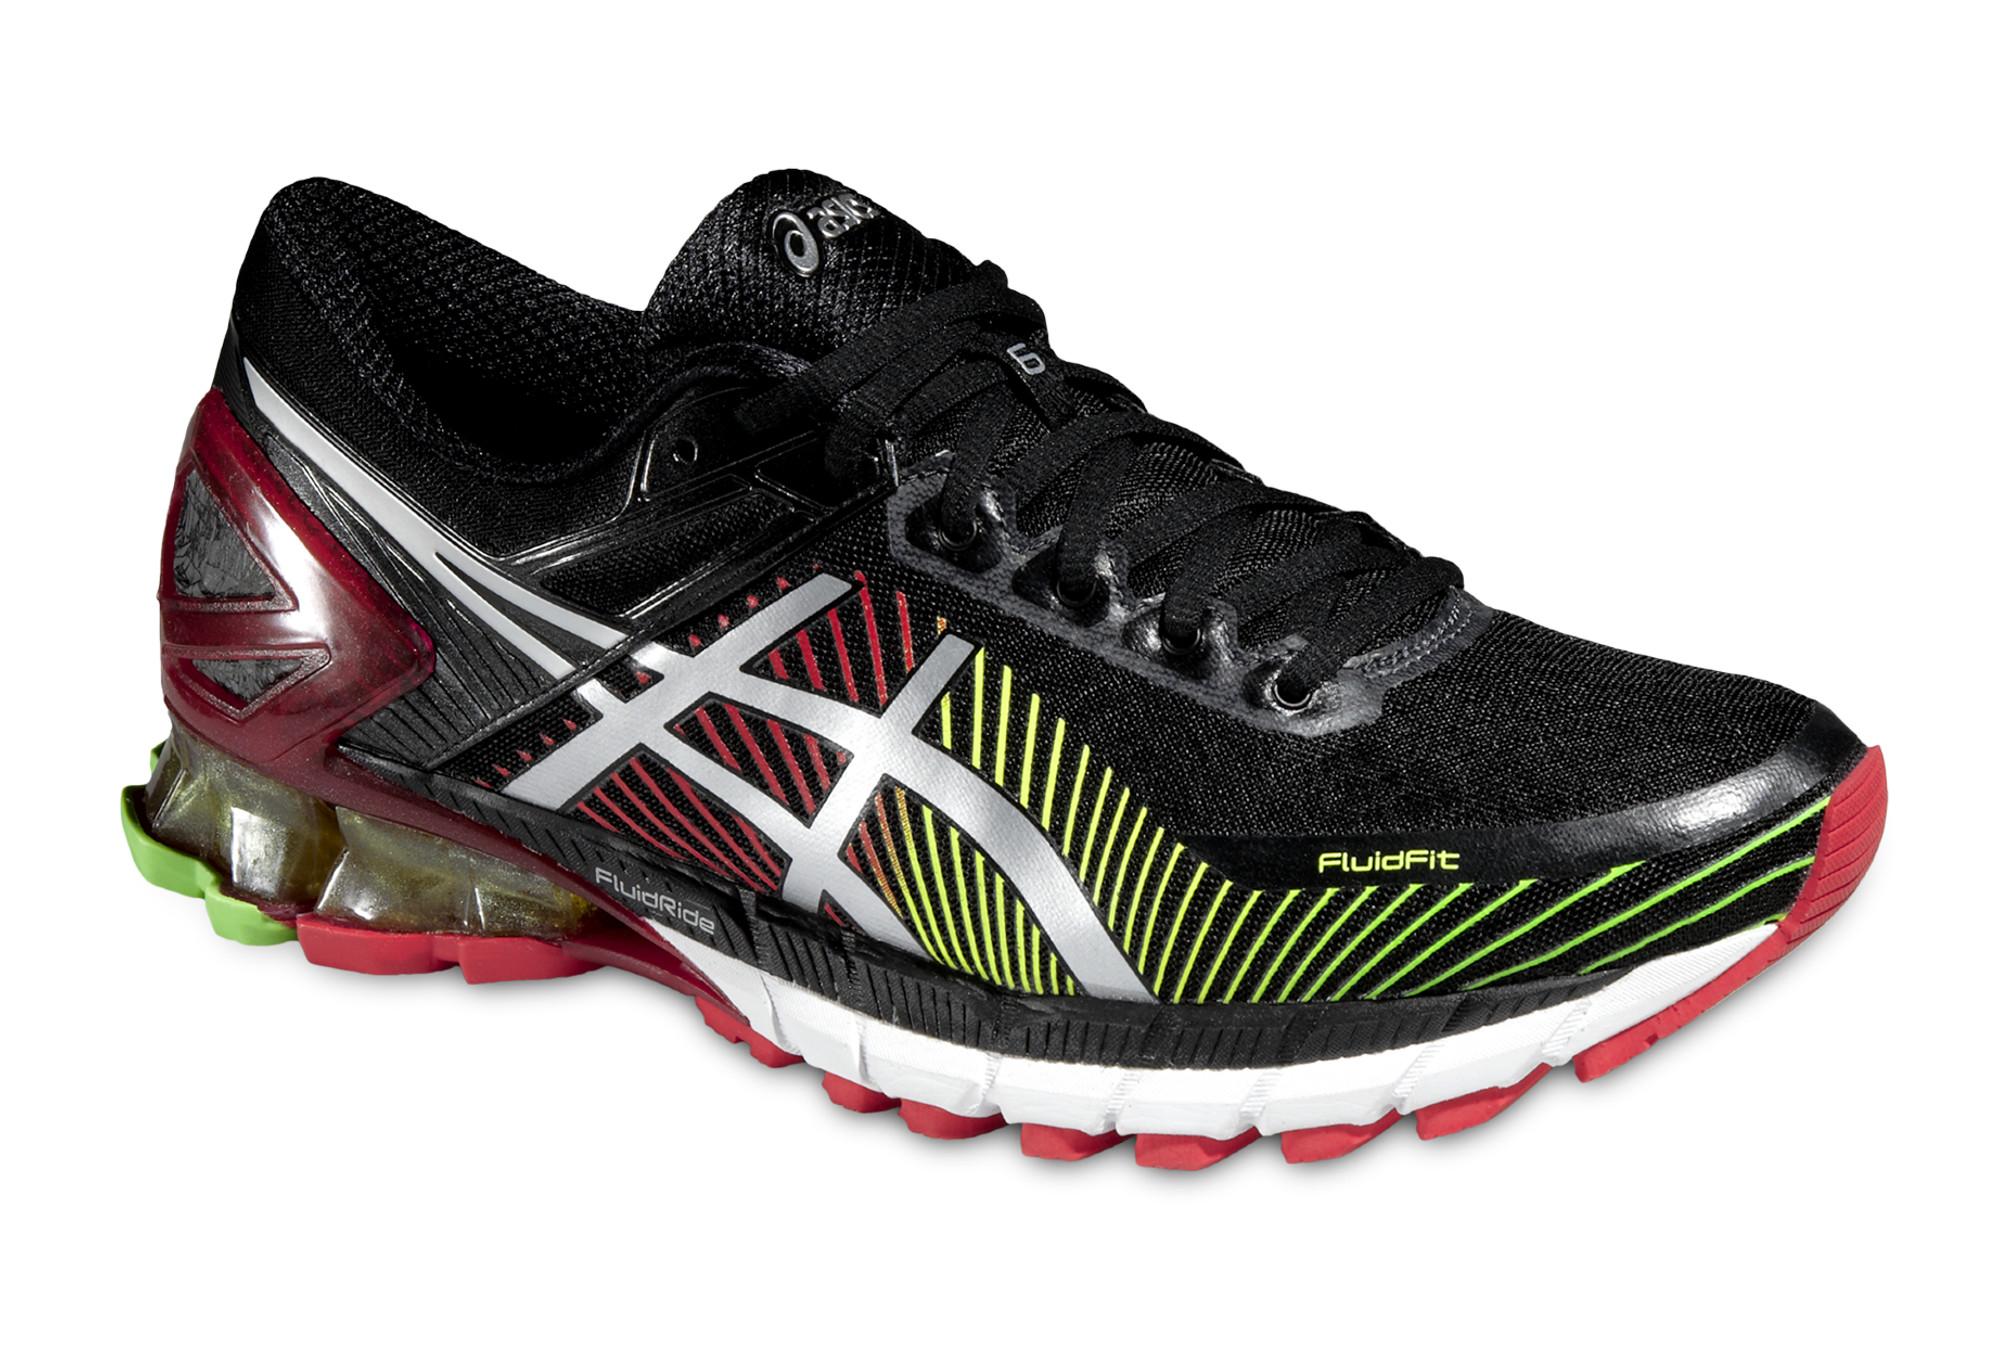 chaussures de running asics gel kinsei 6 n c. Black Bedroom Furniture Sets. Home Design Ideas